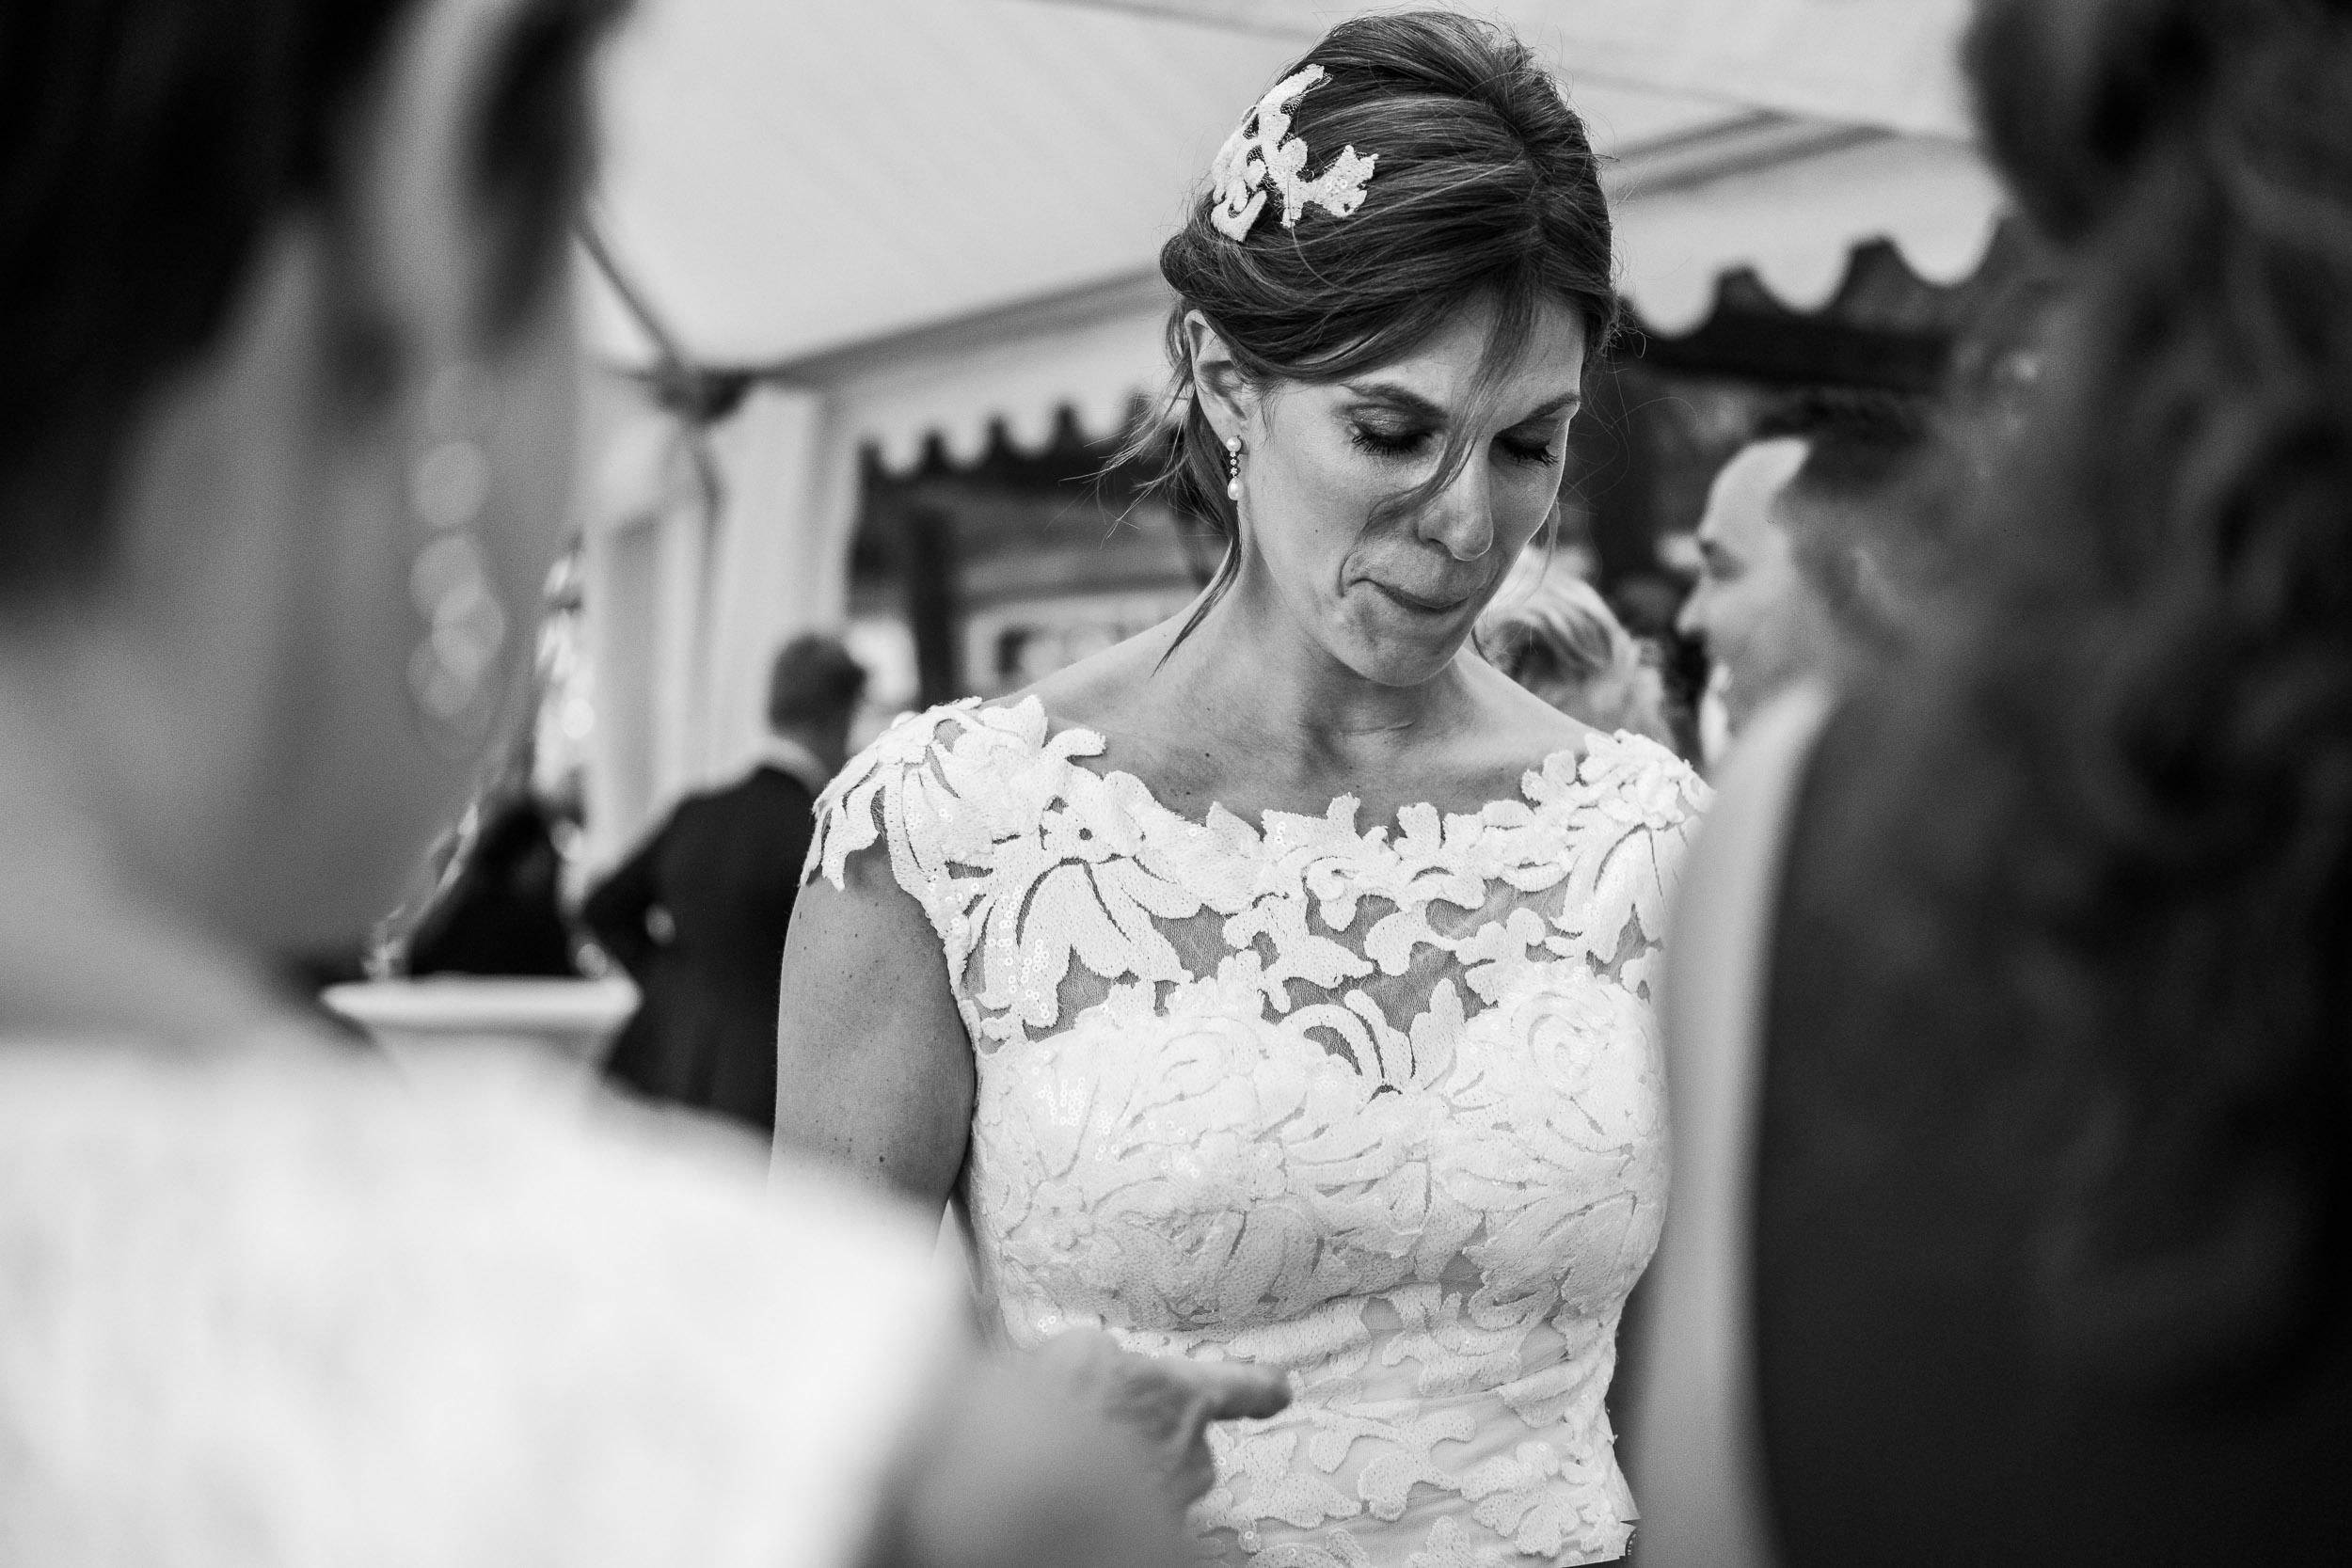 gerald-mattel-photographe-mariage-sallanches-11.jpg